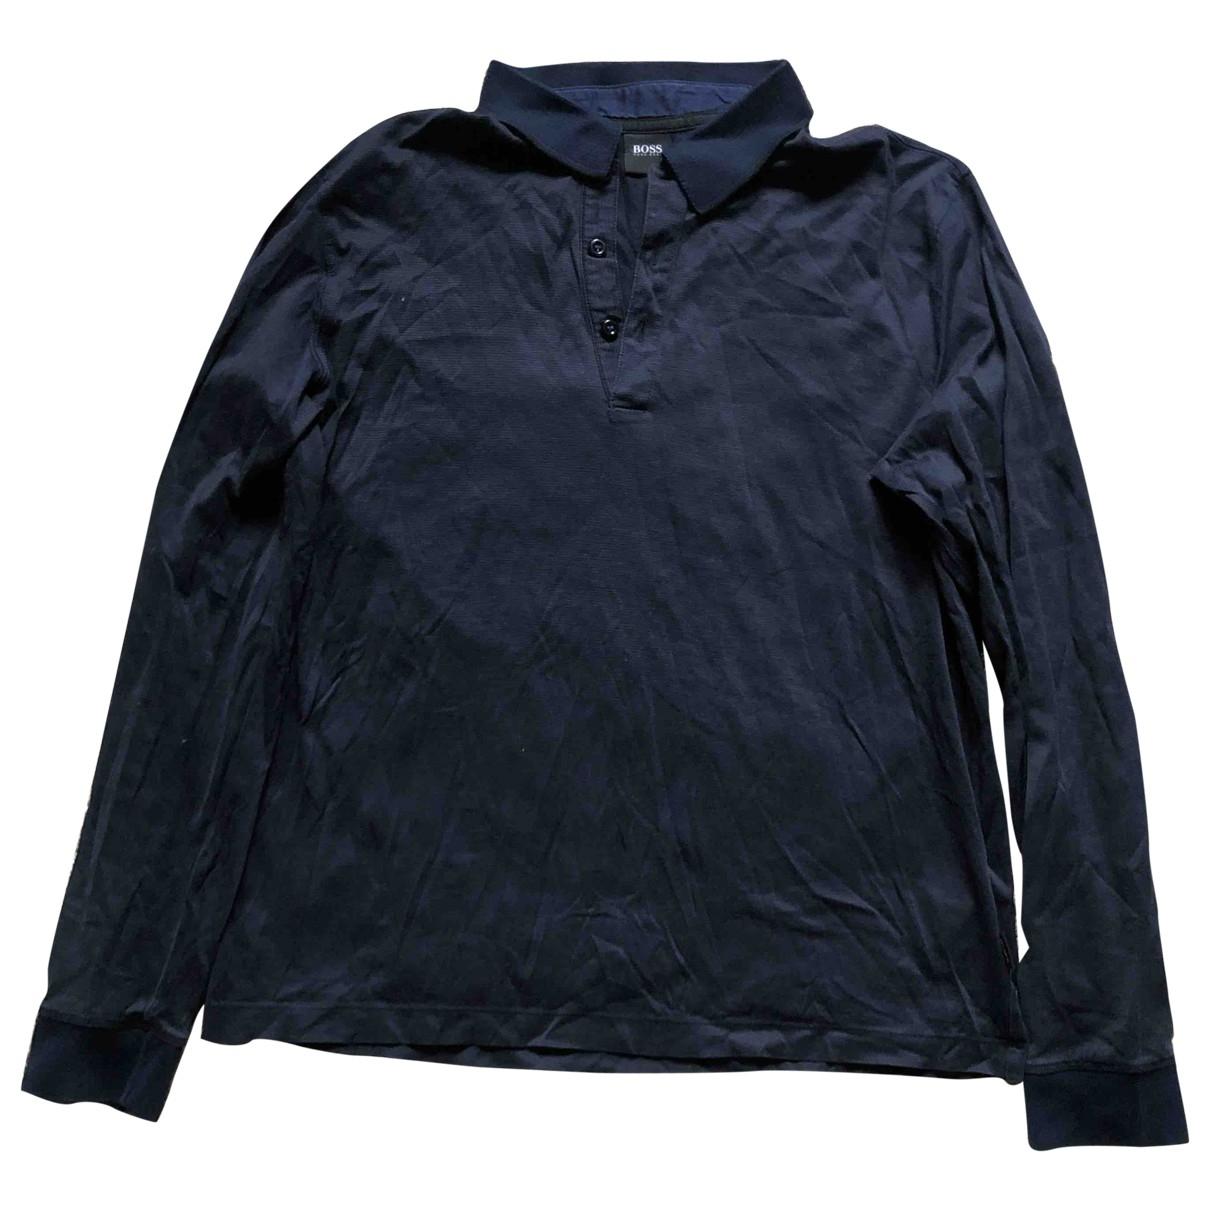 Hugo Boss \N Navy Cotton Polo shirts for Men S International